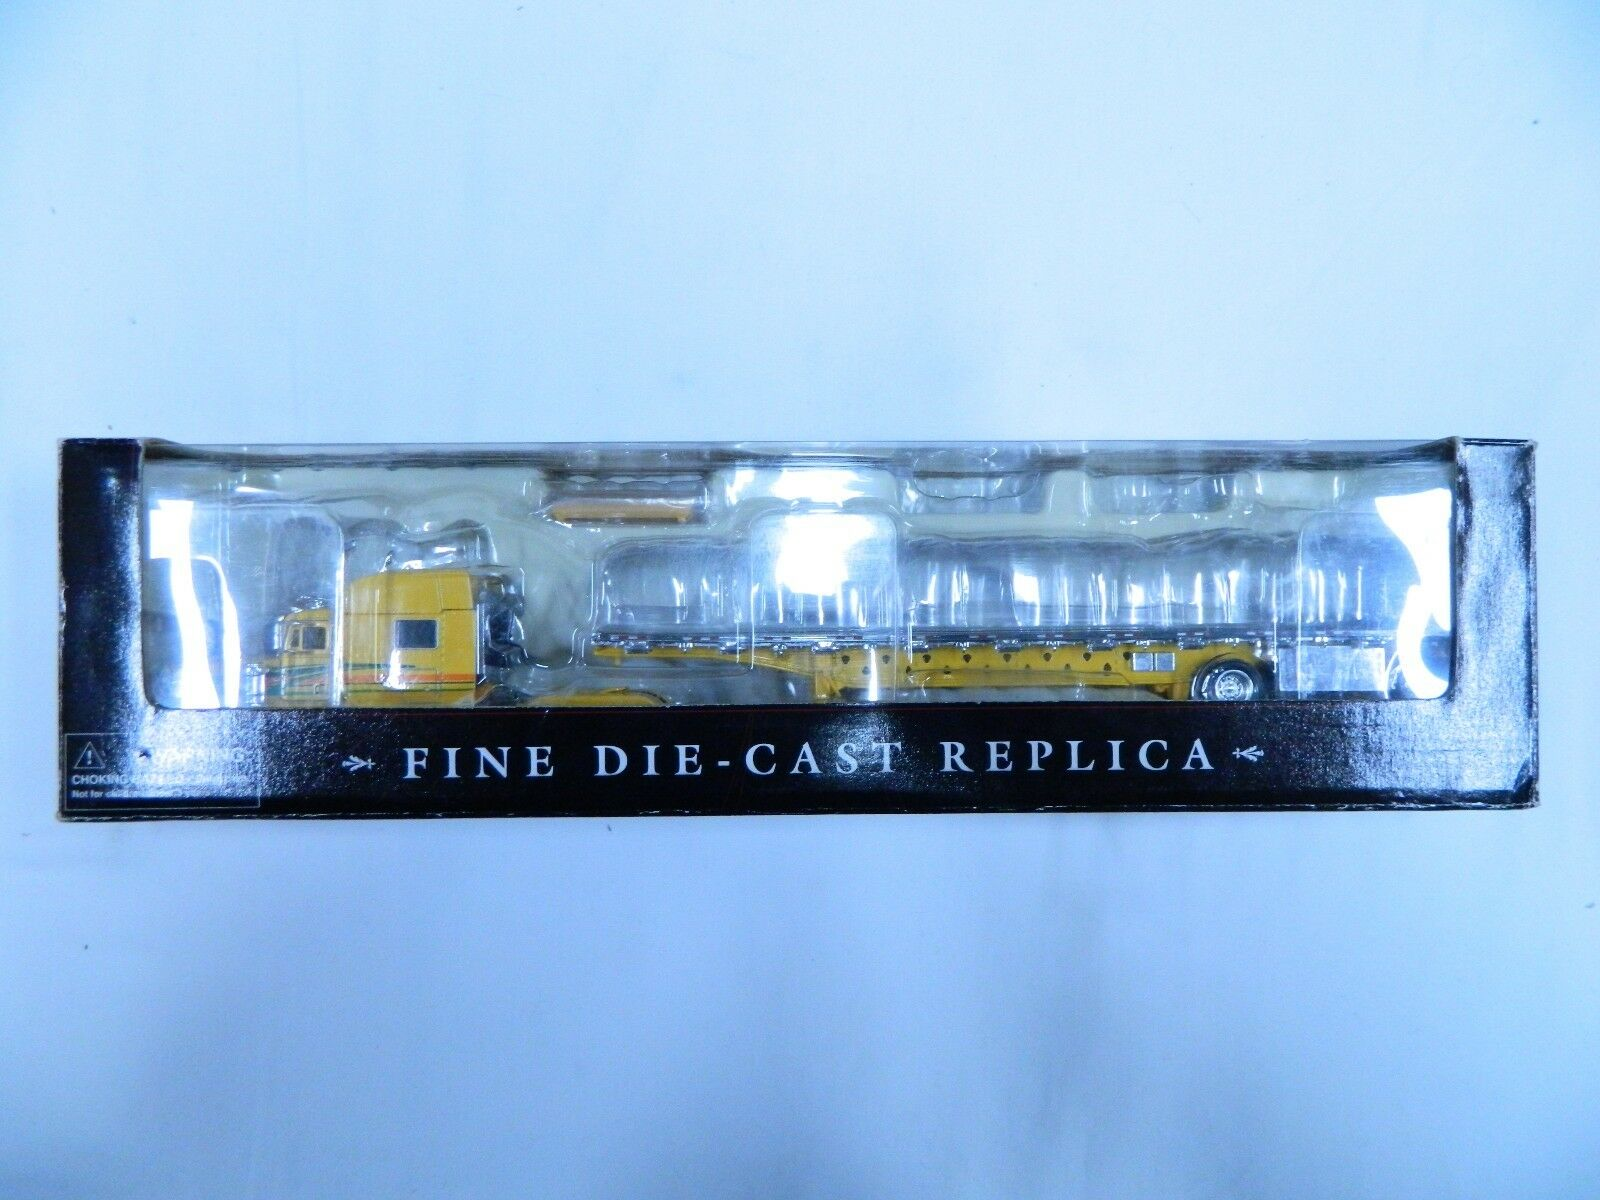 Tonkin Replicas o/s 12 Amarillo Peterbilt 379X Cama Plana extendido Eje de remolque 153